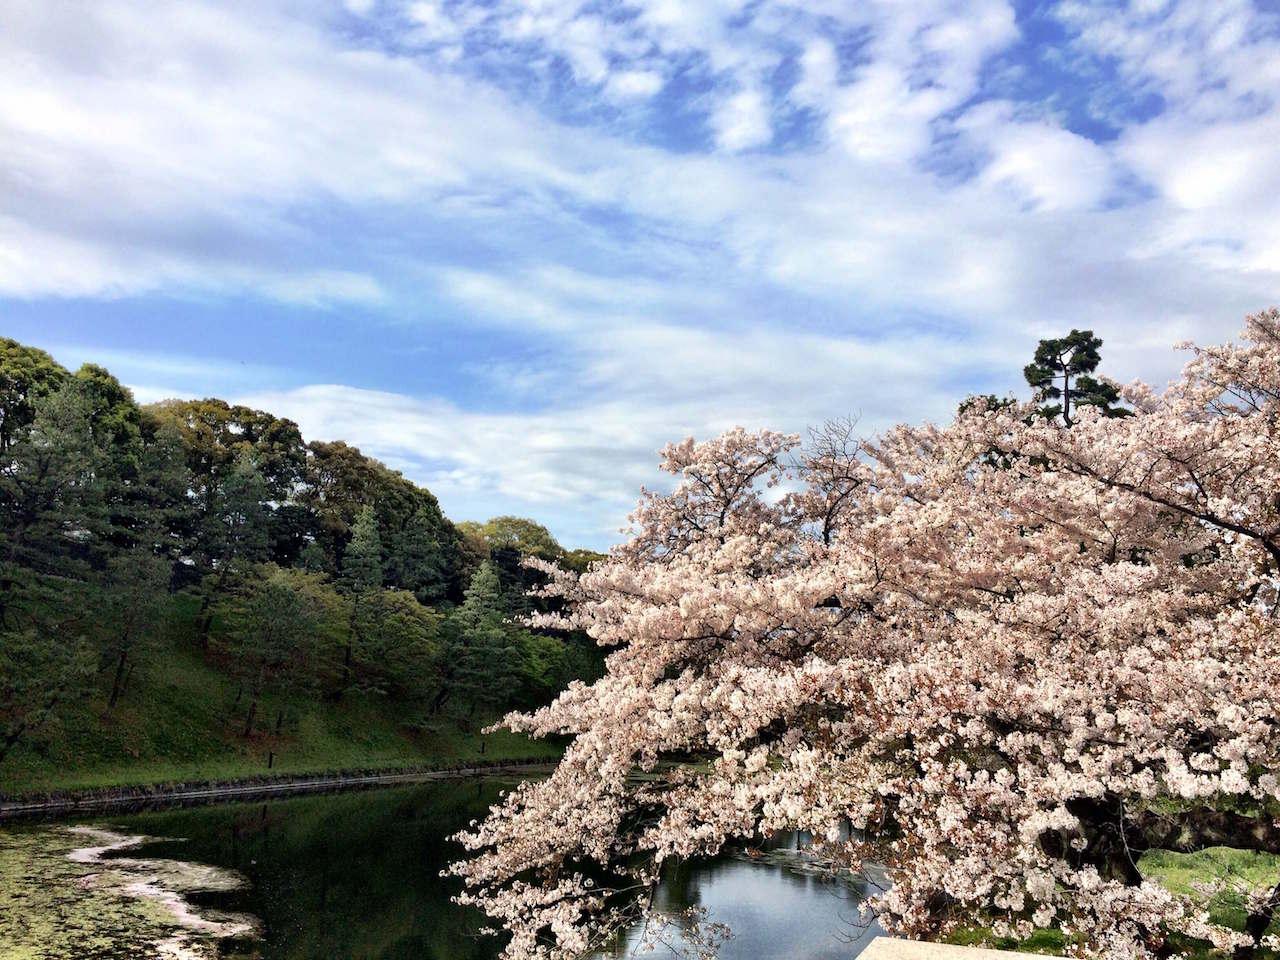 Kirschblüten in Tokio Annaway Travelblog 1oop